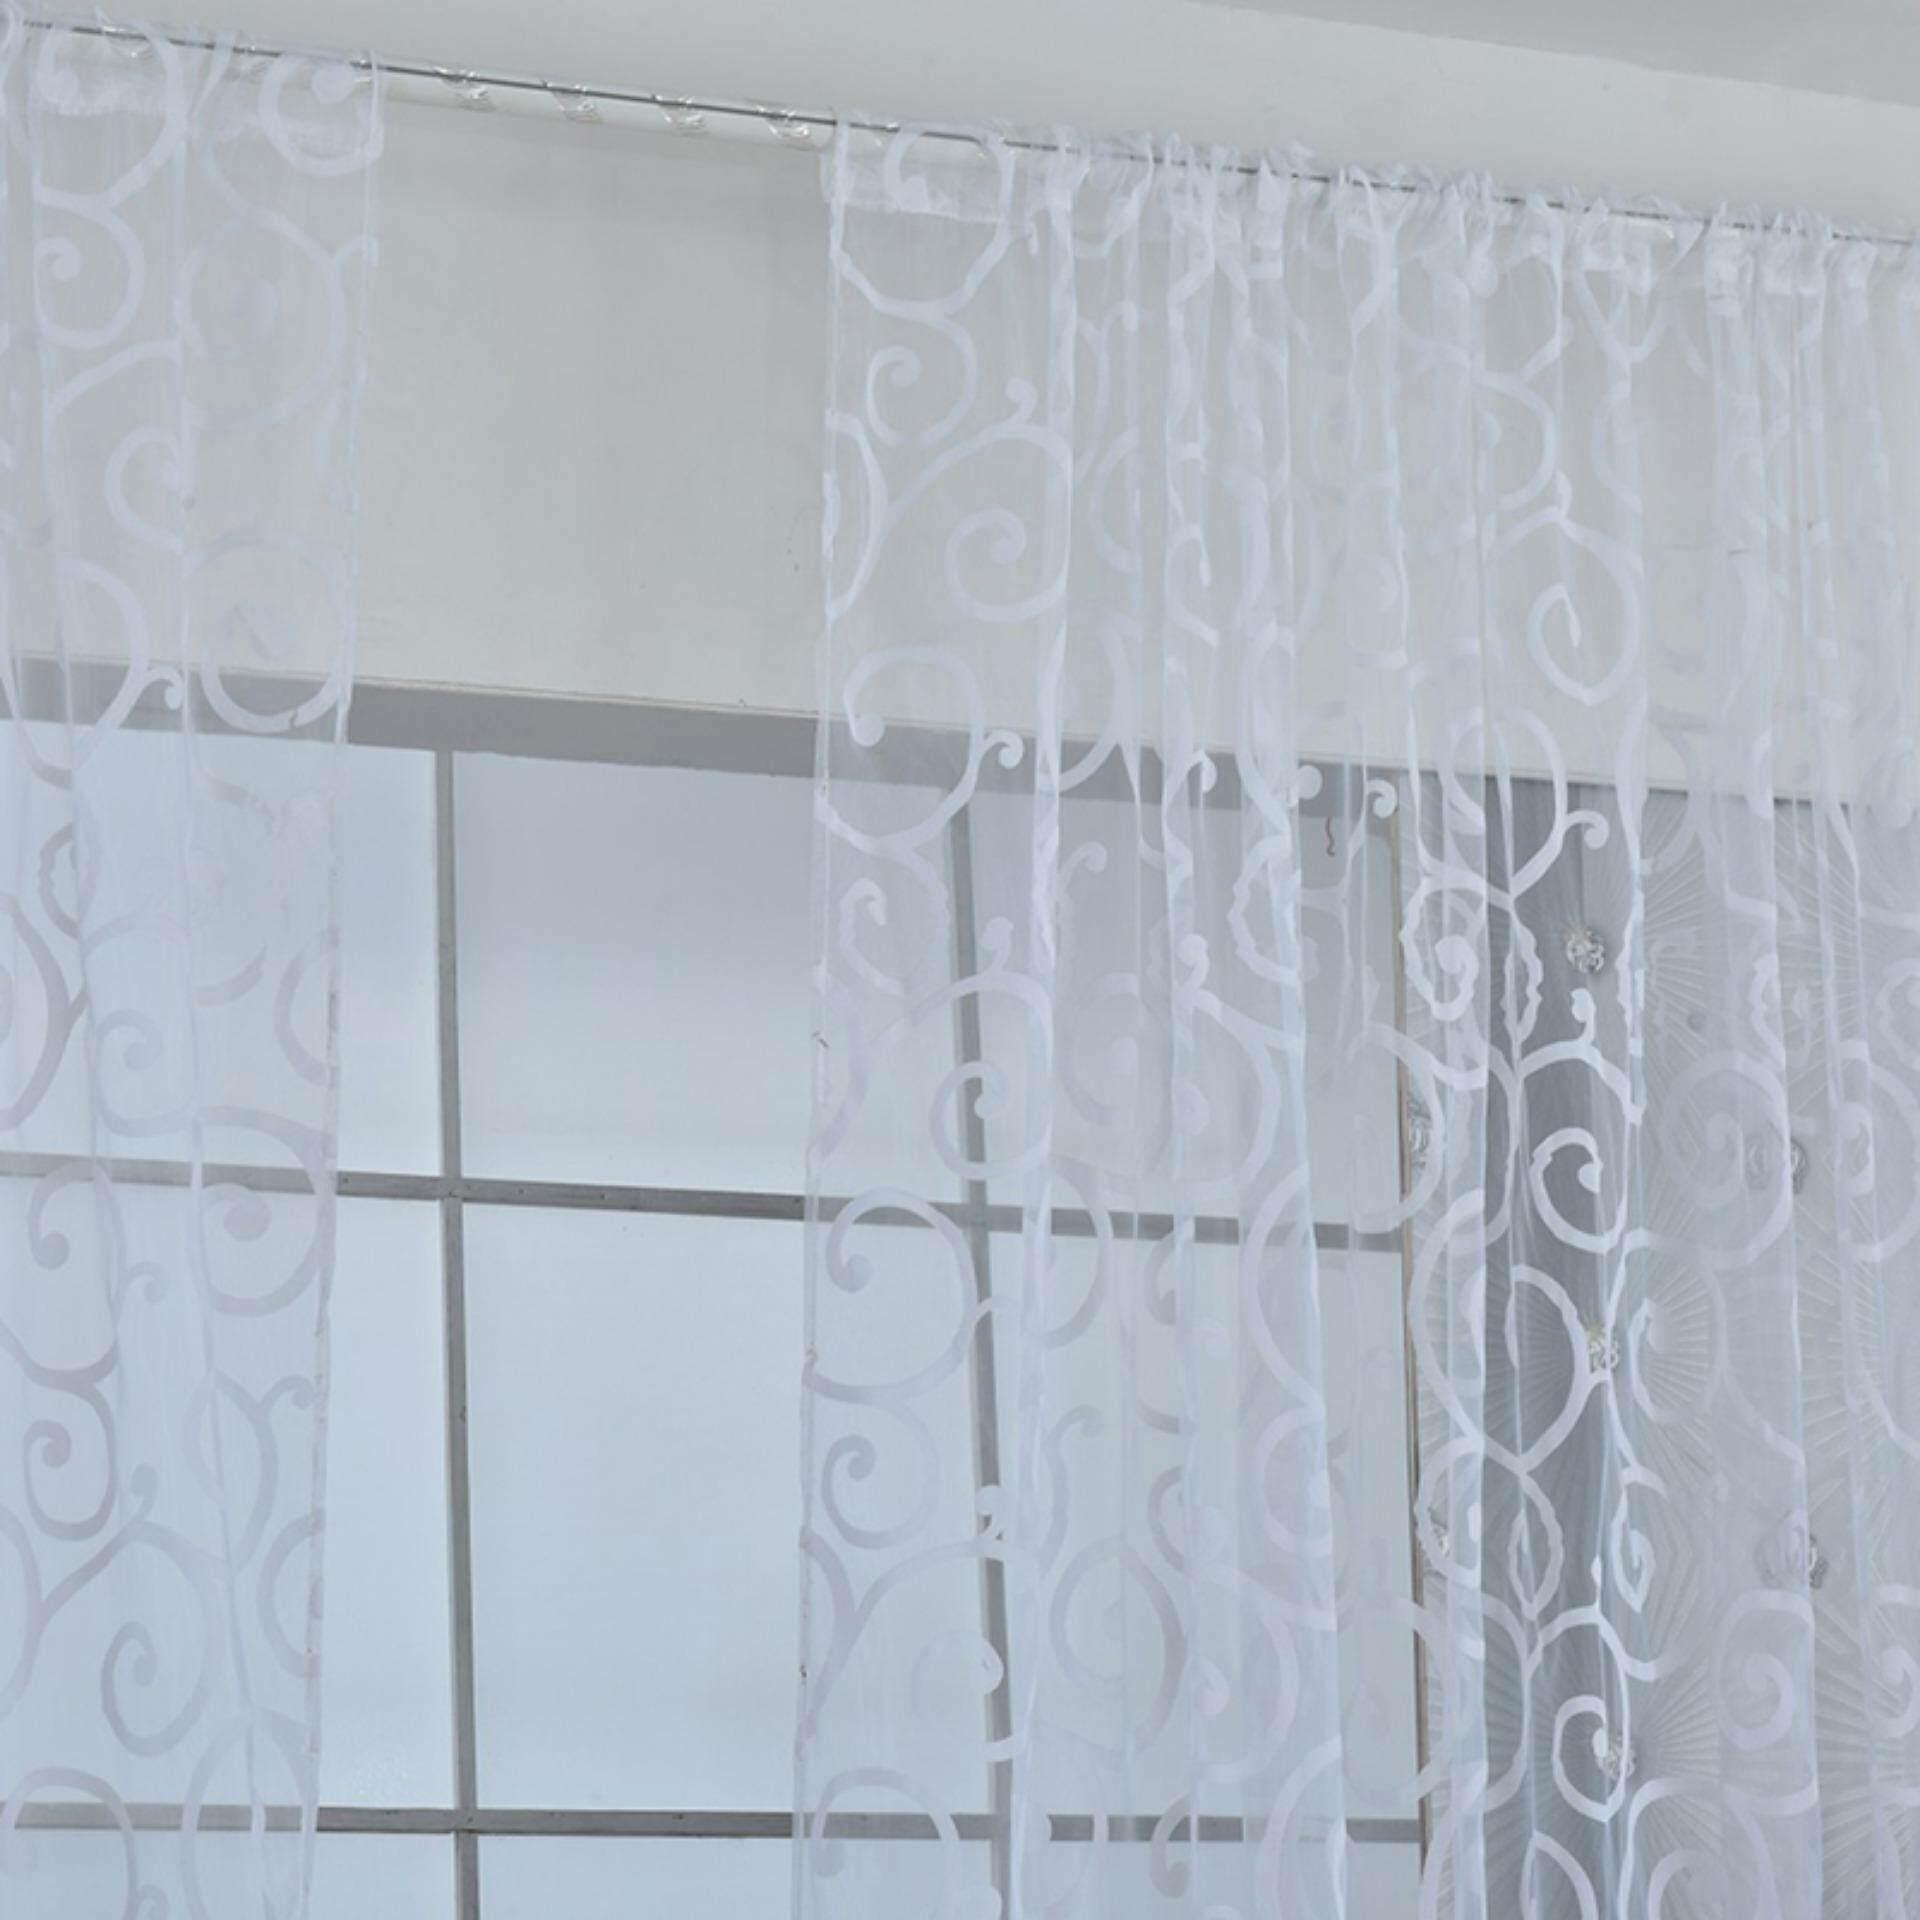 Fashion Bordir Layar Tirai Luxury Percetakan Flock Jendela Gorden Layar Putih 100*200 Cm-